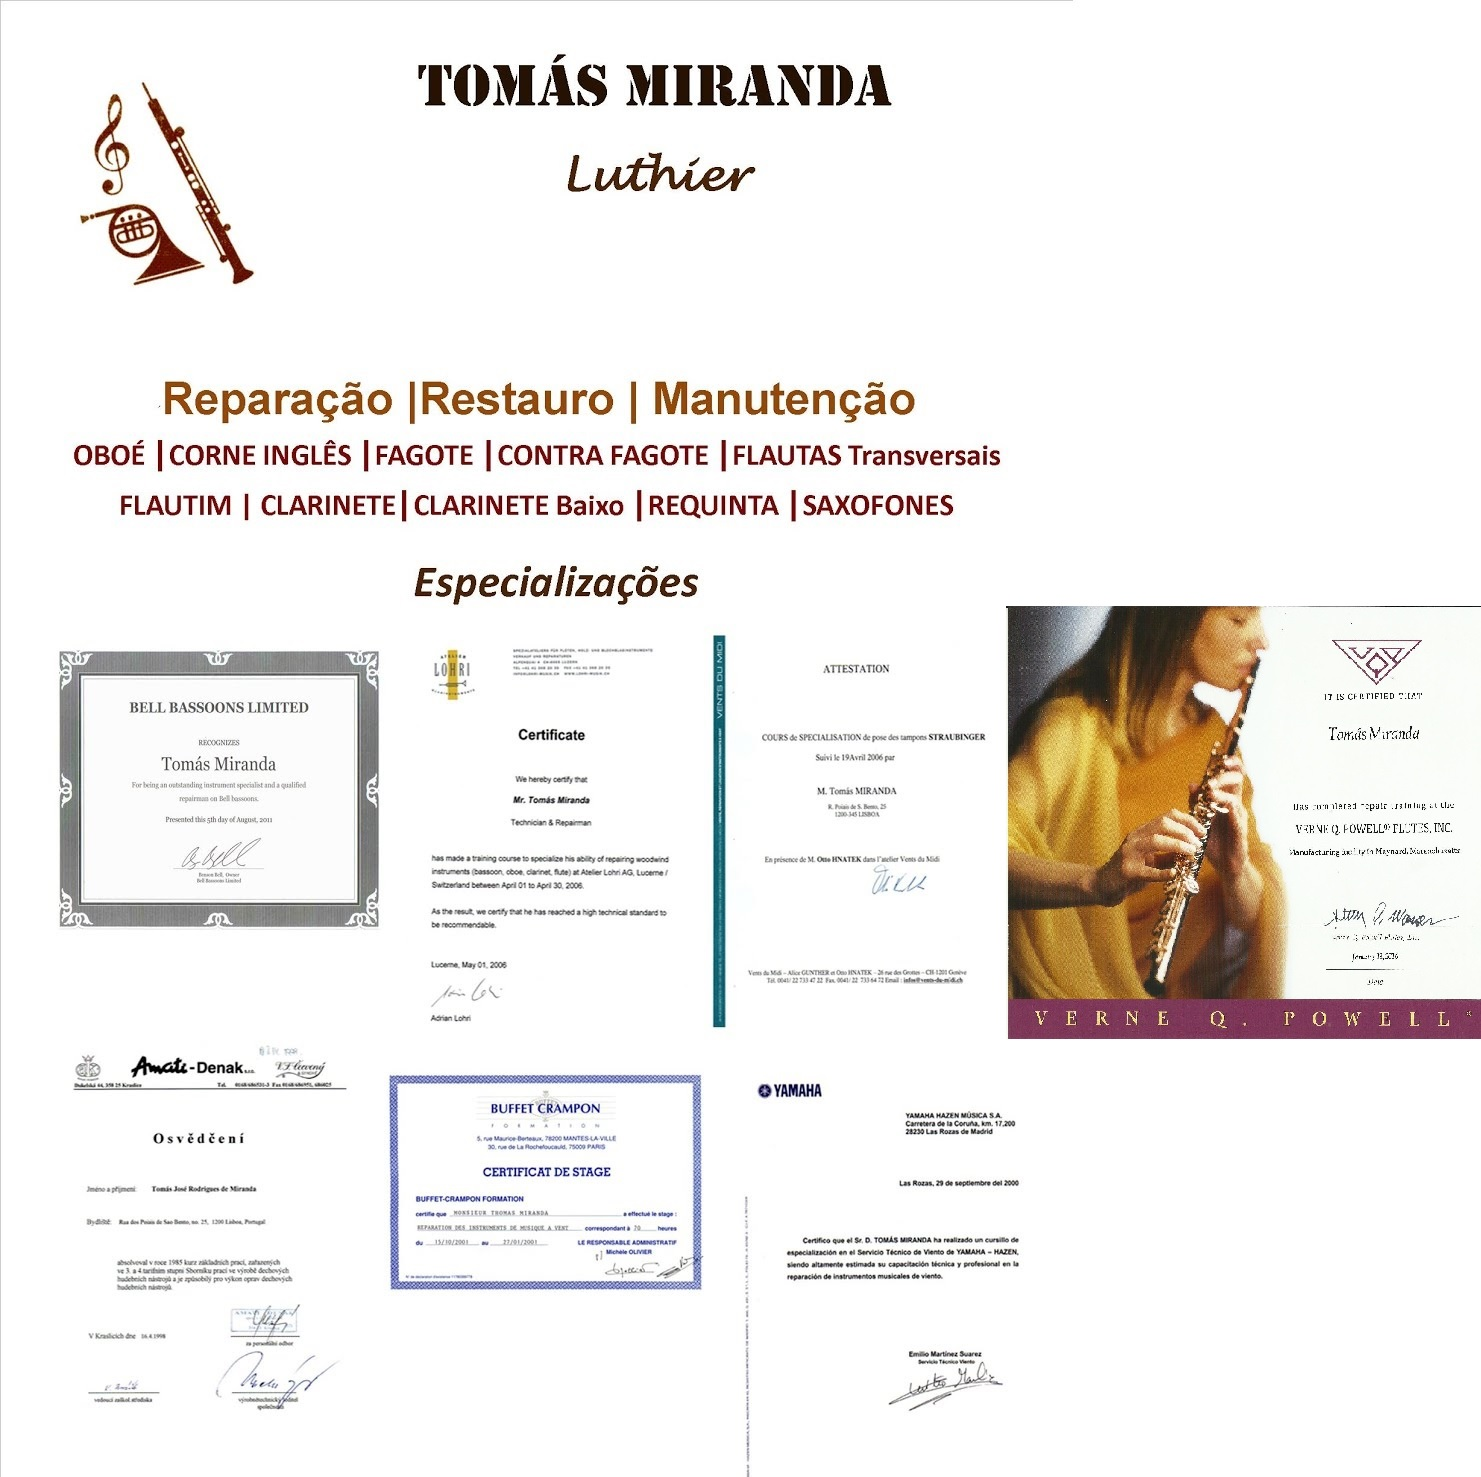 TOMAS MIRANDA